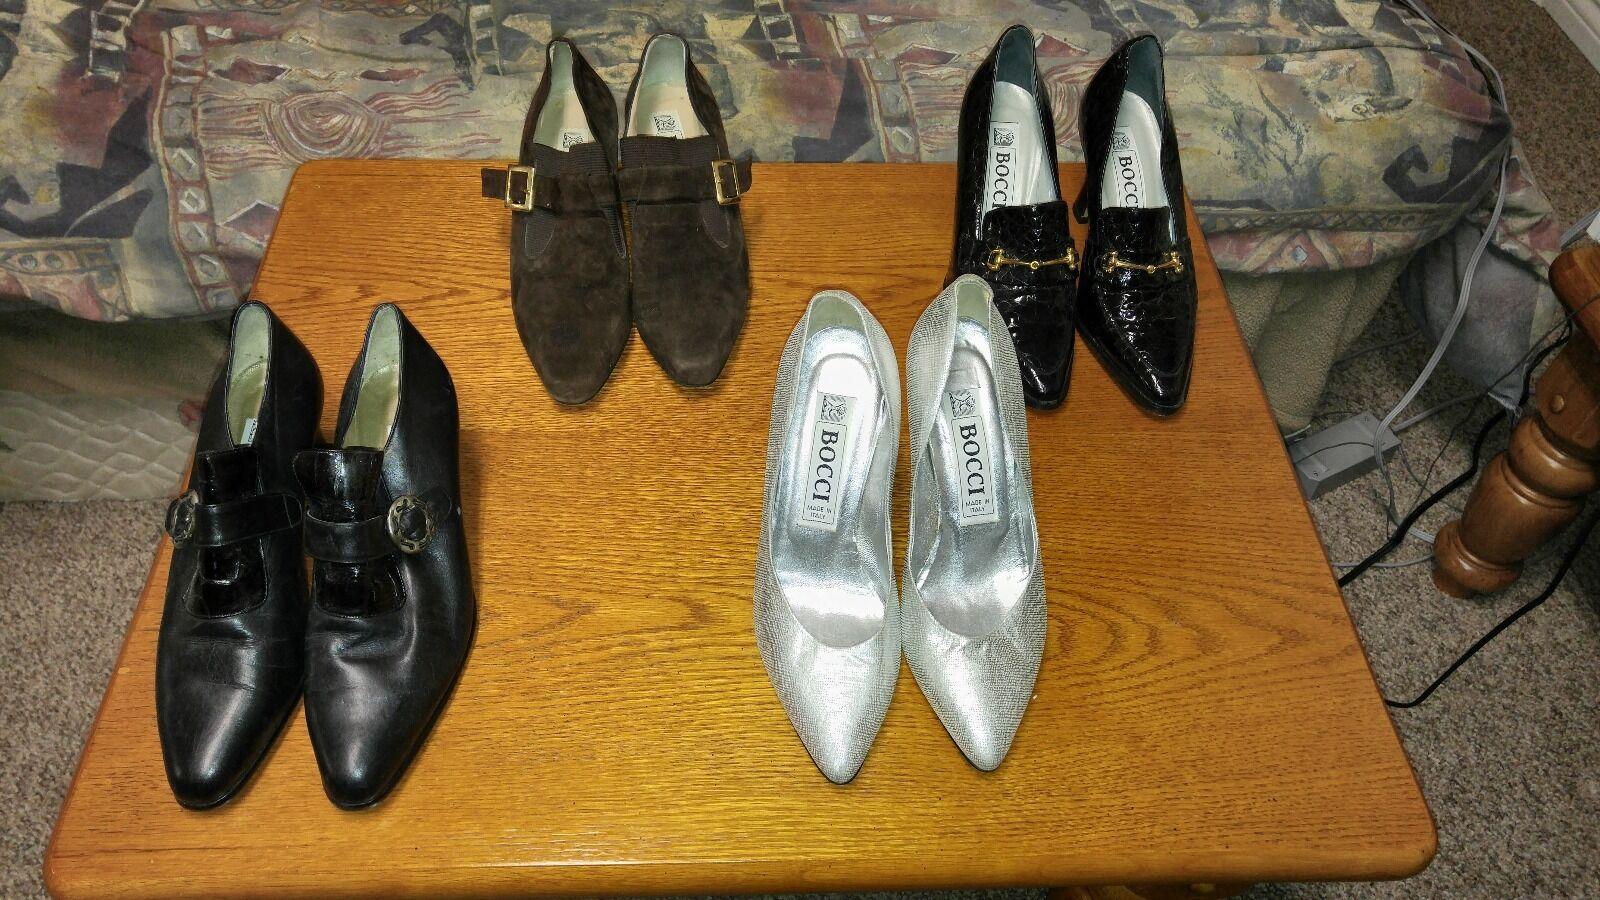 4 Bocci high heels